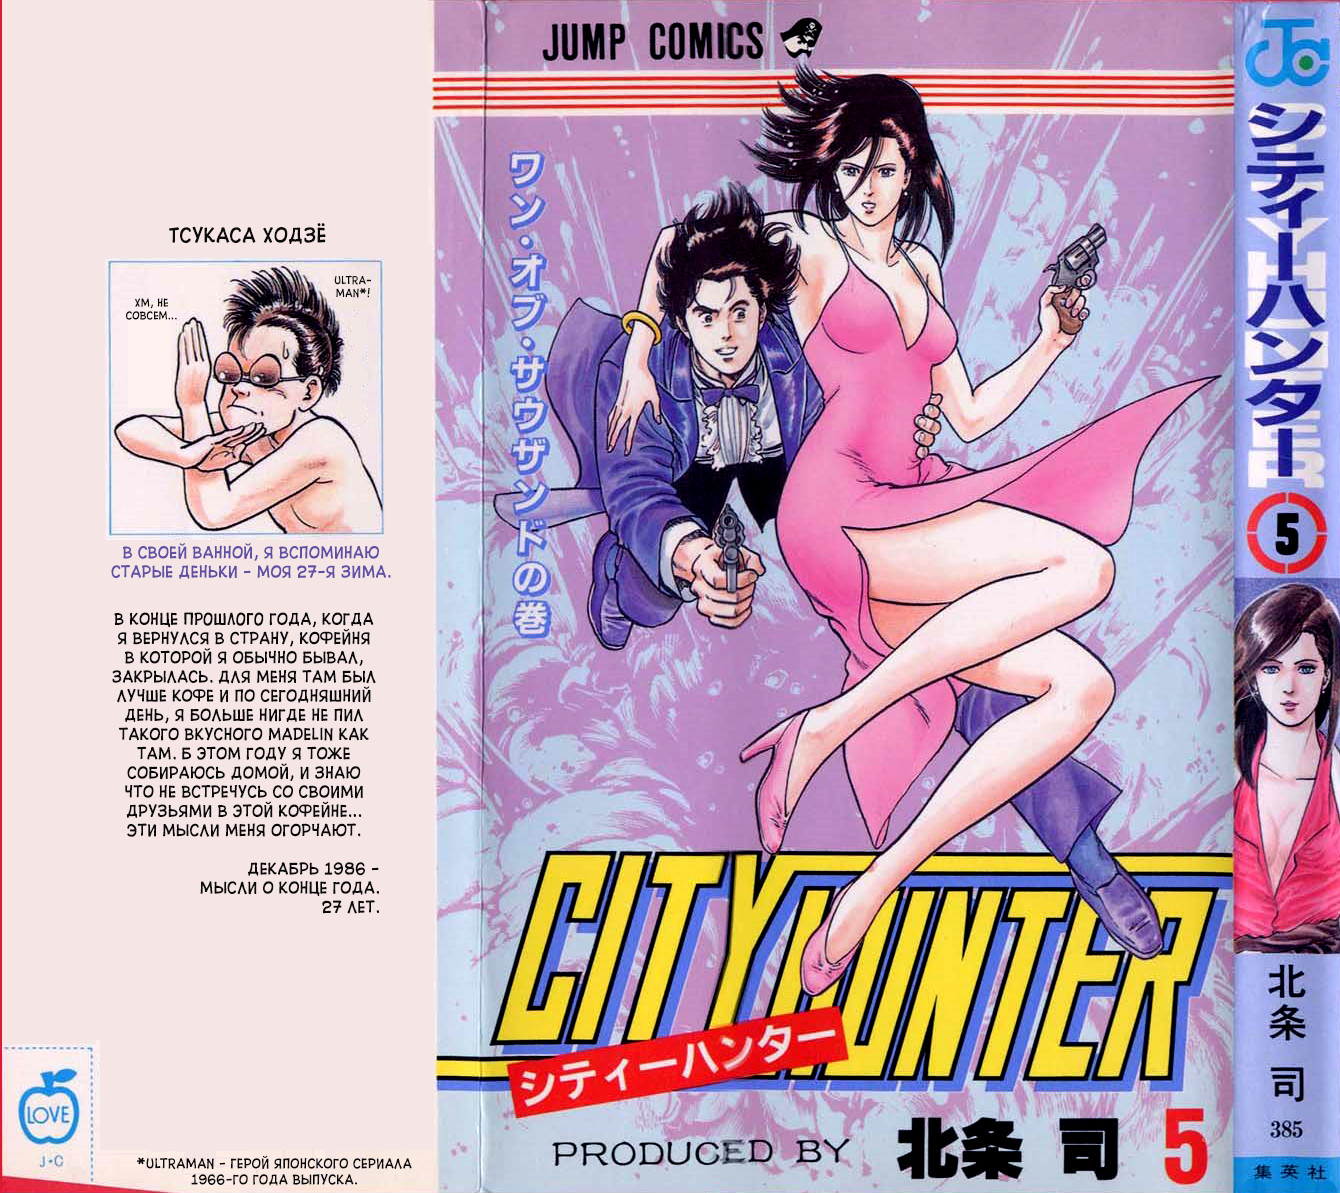 https://r1.ninemanga.com/comics/pic2/61/24893/268382/1436851316635.jpg Page 1